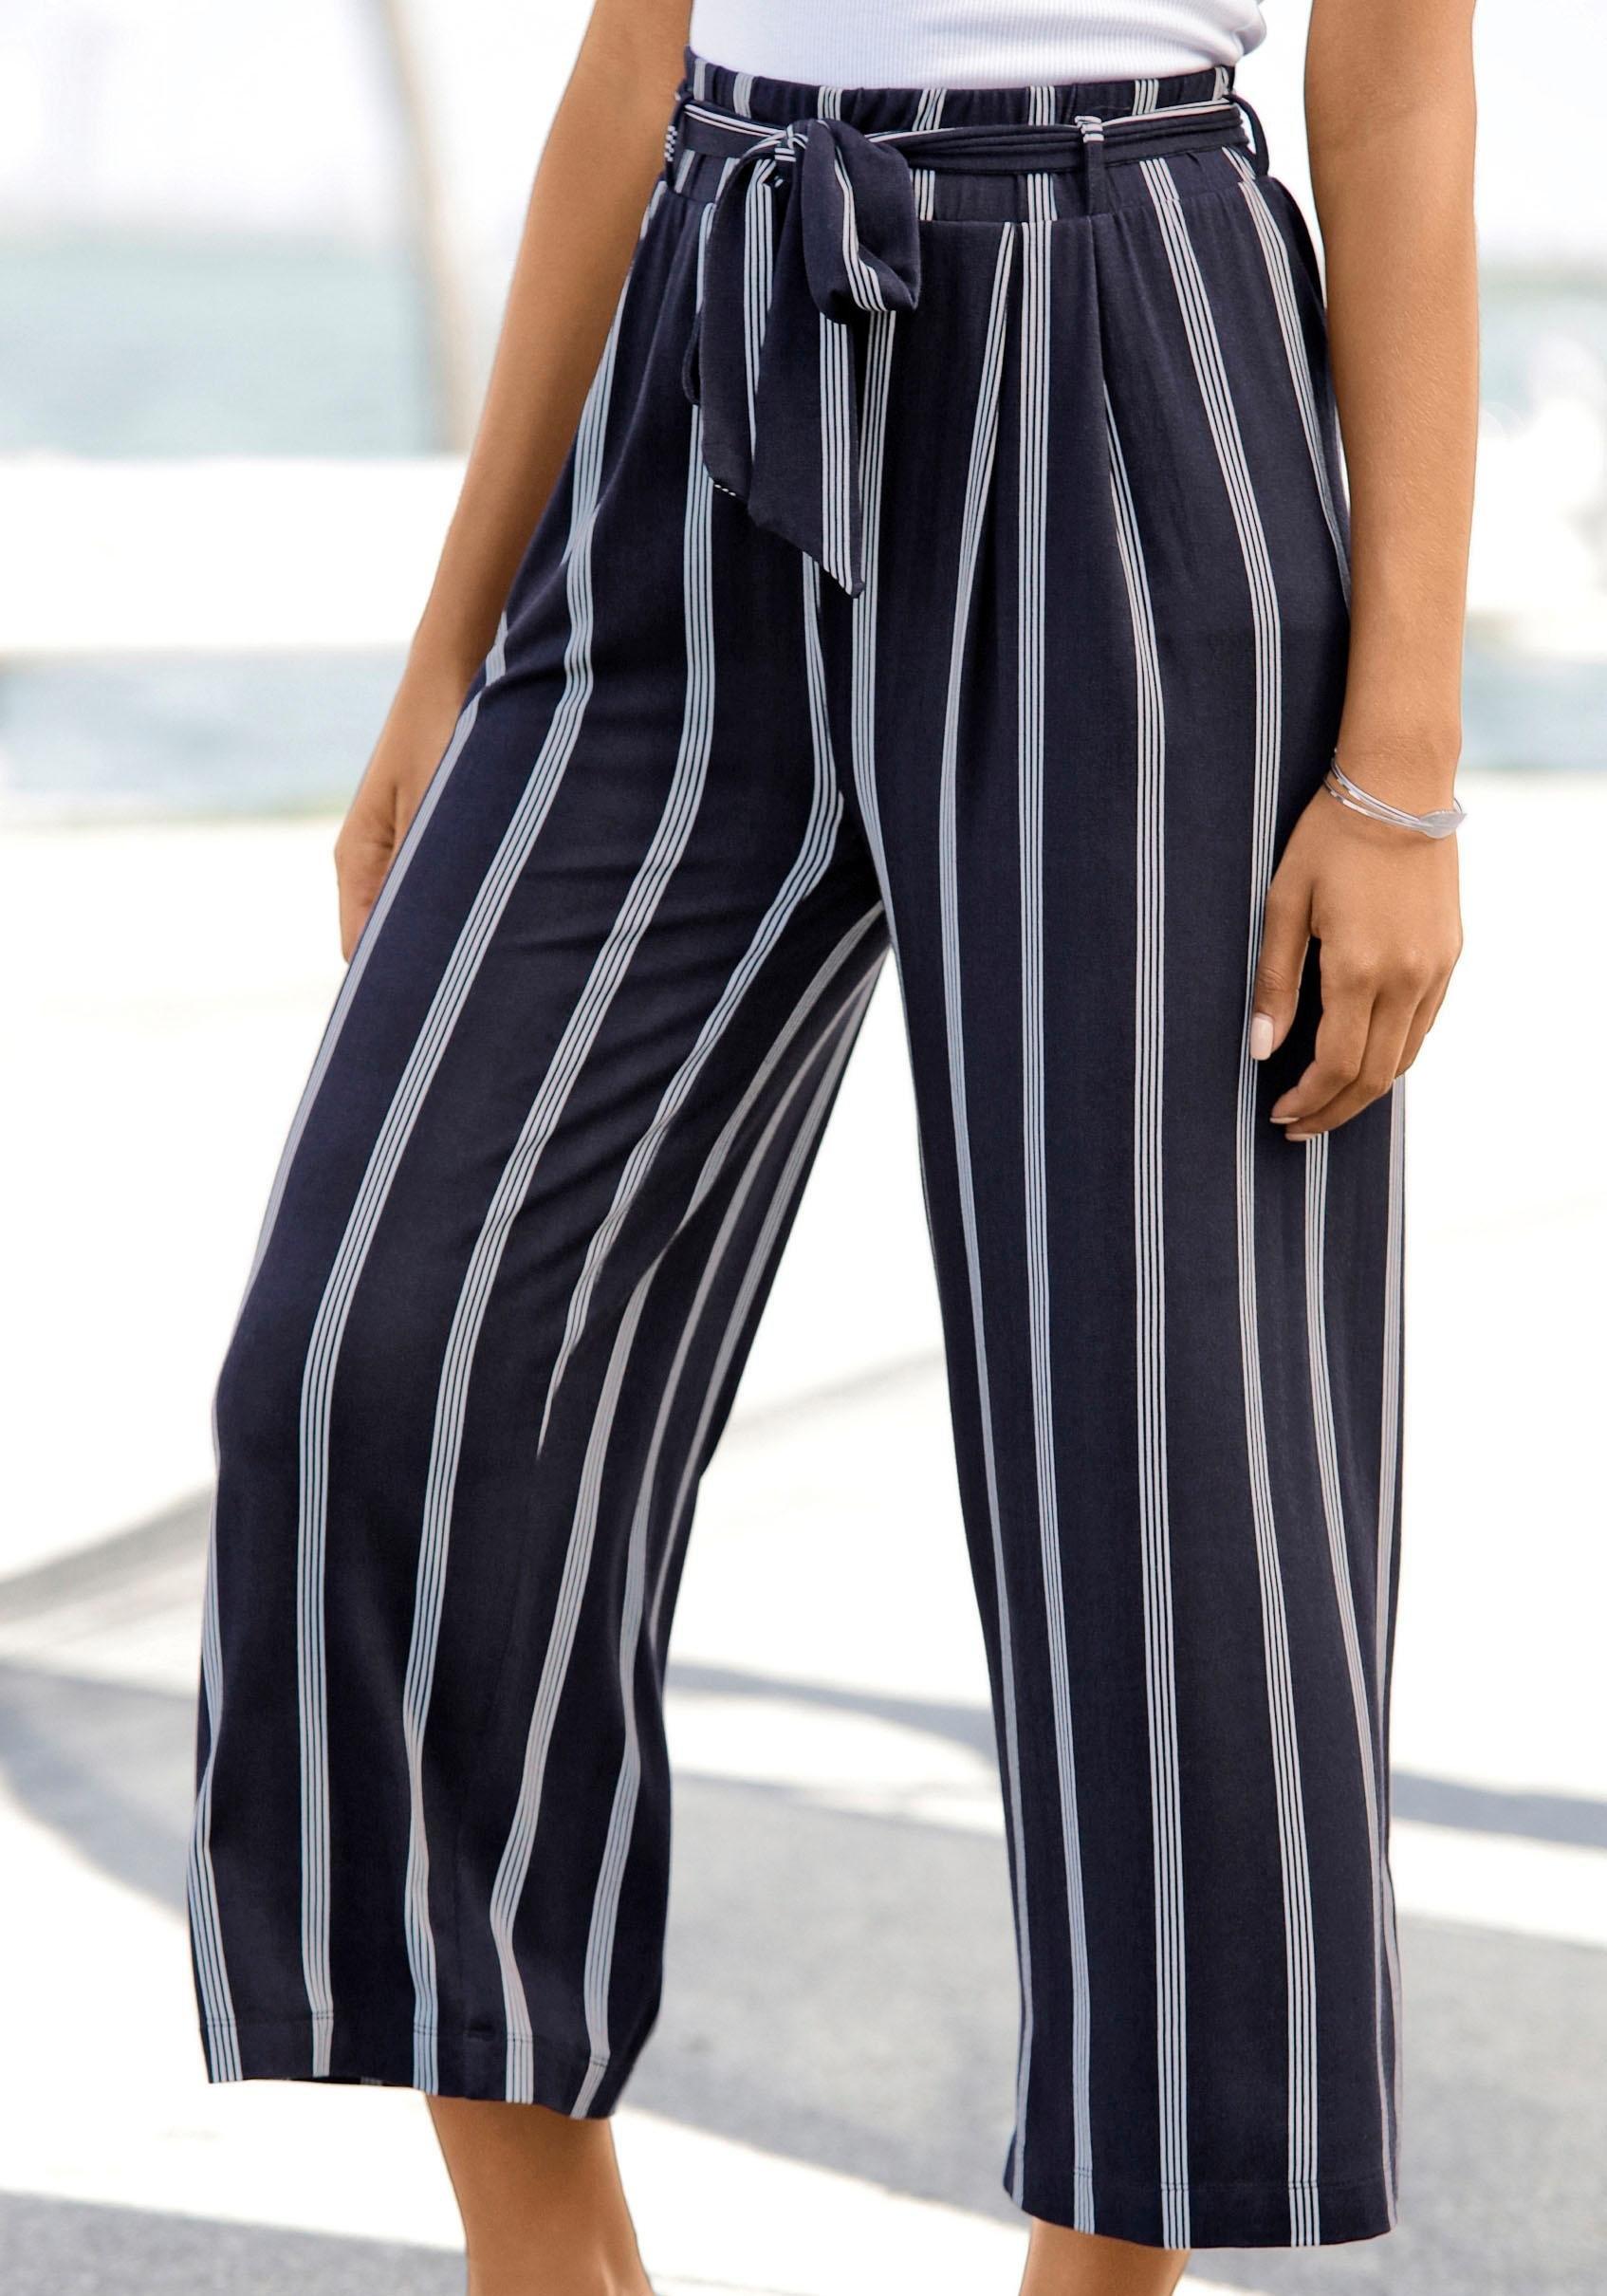 LASCANA culotte bij Lascana online kopen